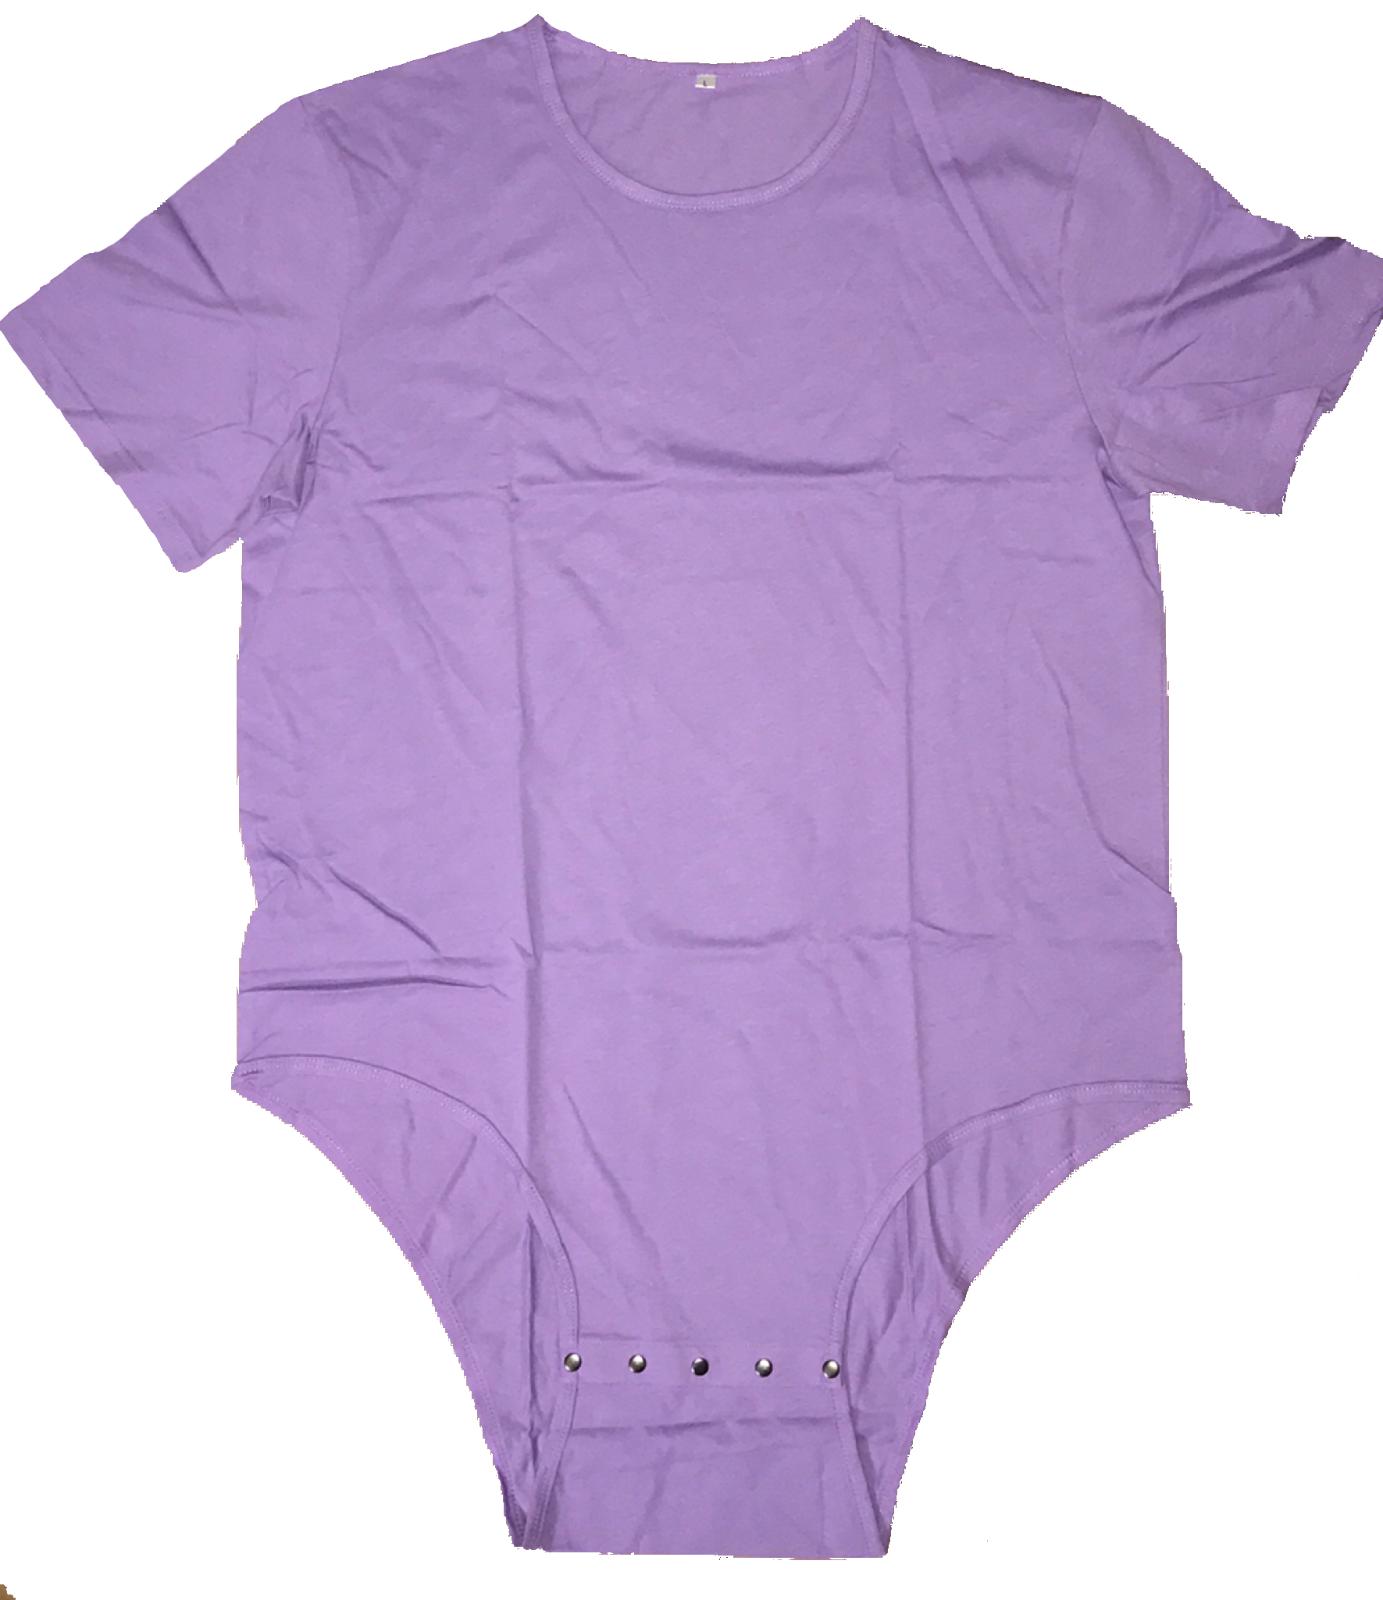 1689f4cb1f Adult Romper Onesie Snap Crotch in Purple on Storenvy